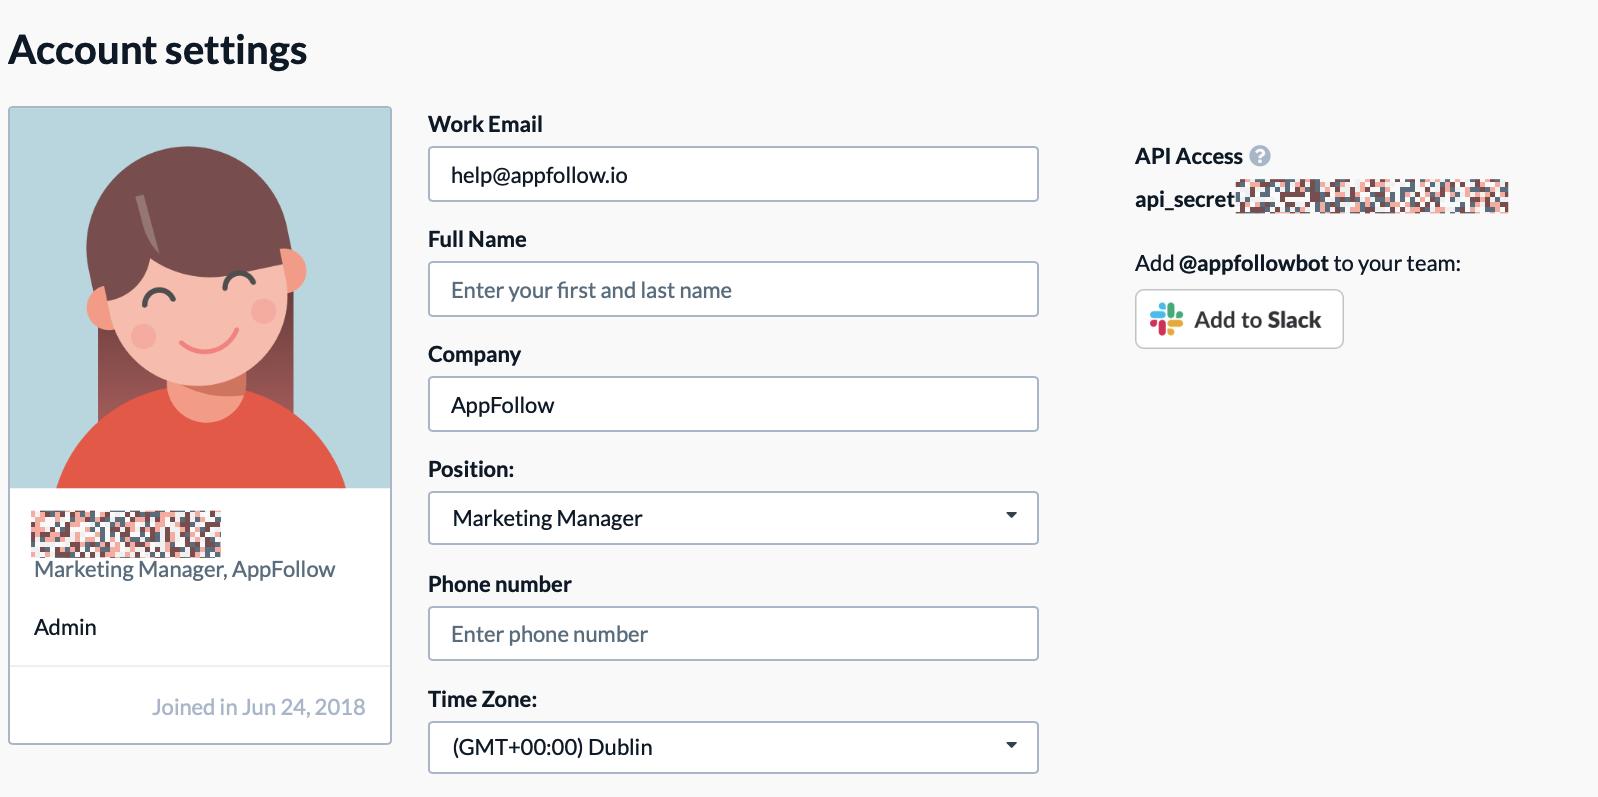 AppFollow API Key in account